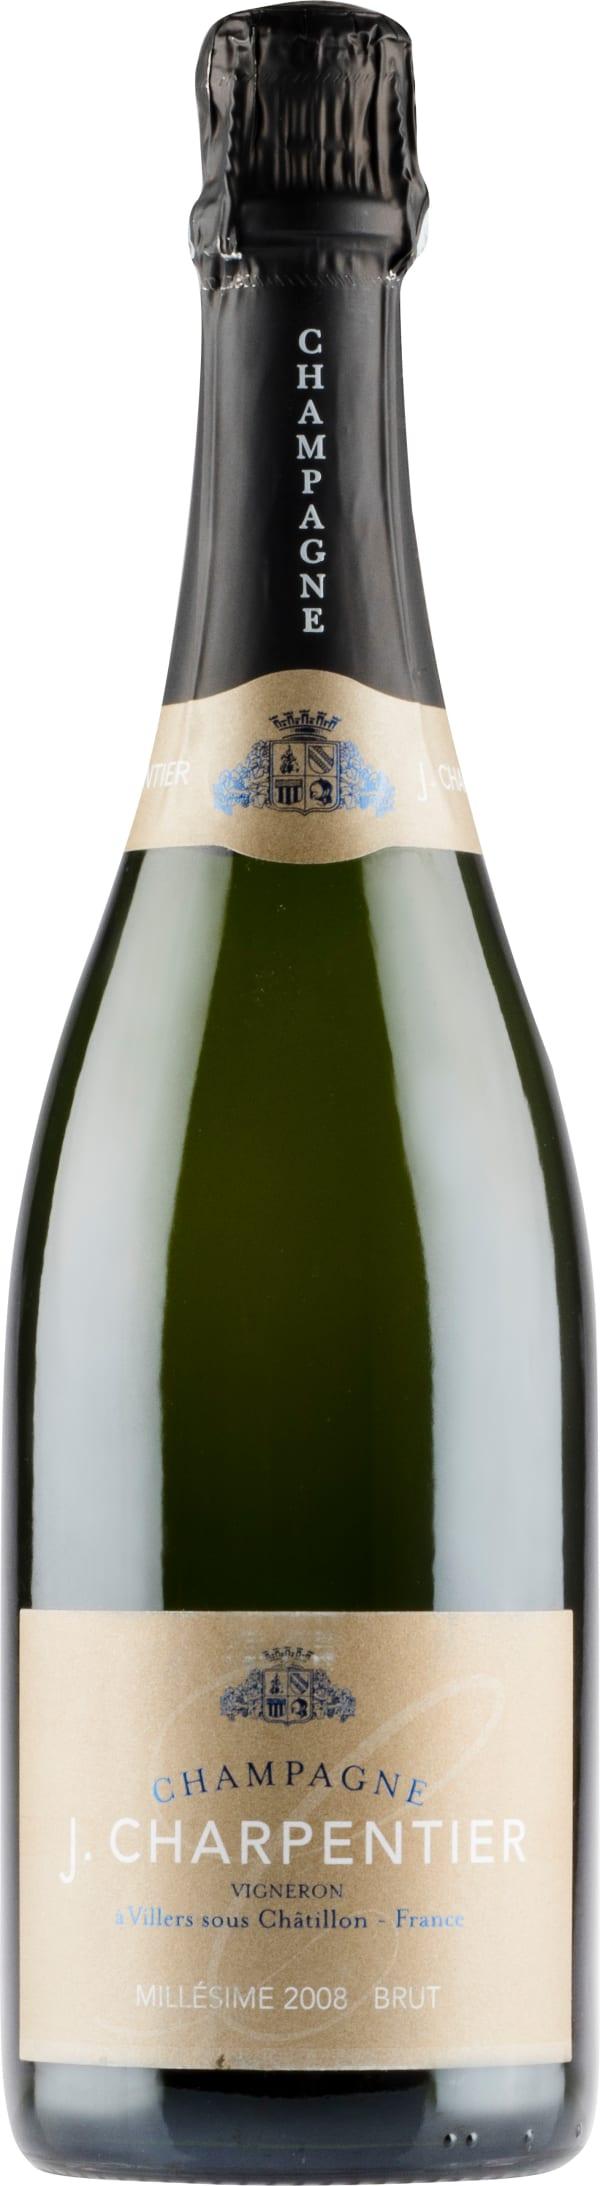 J. Charpentier Millésime Champagne Brut 2008